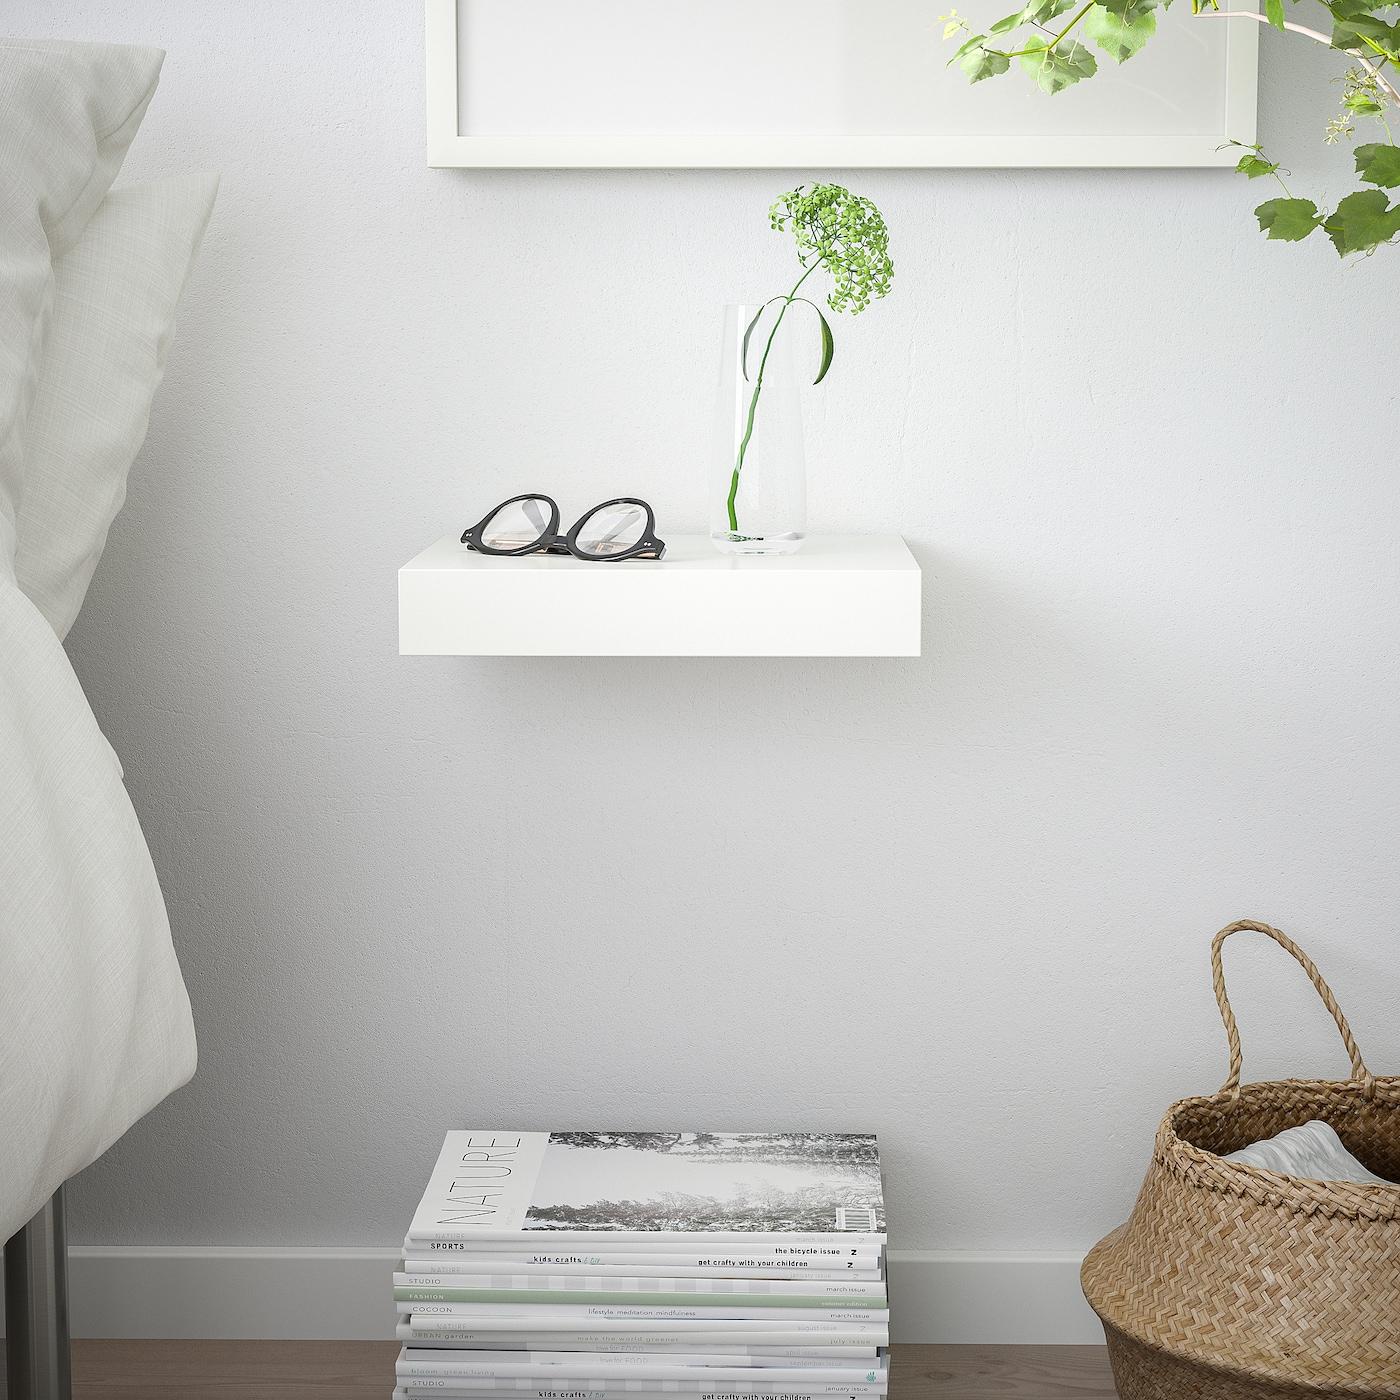 LACK Wandregal weiß IKEA Österreich